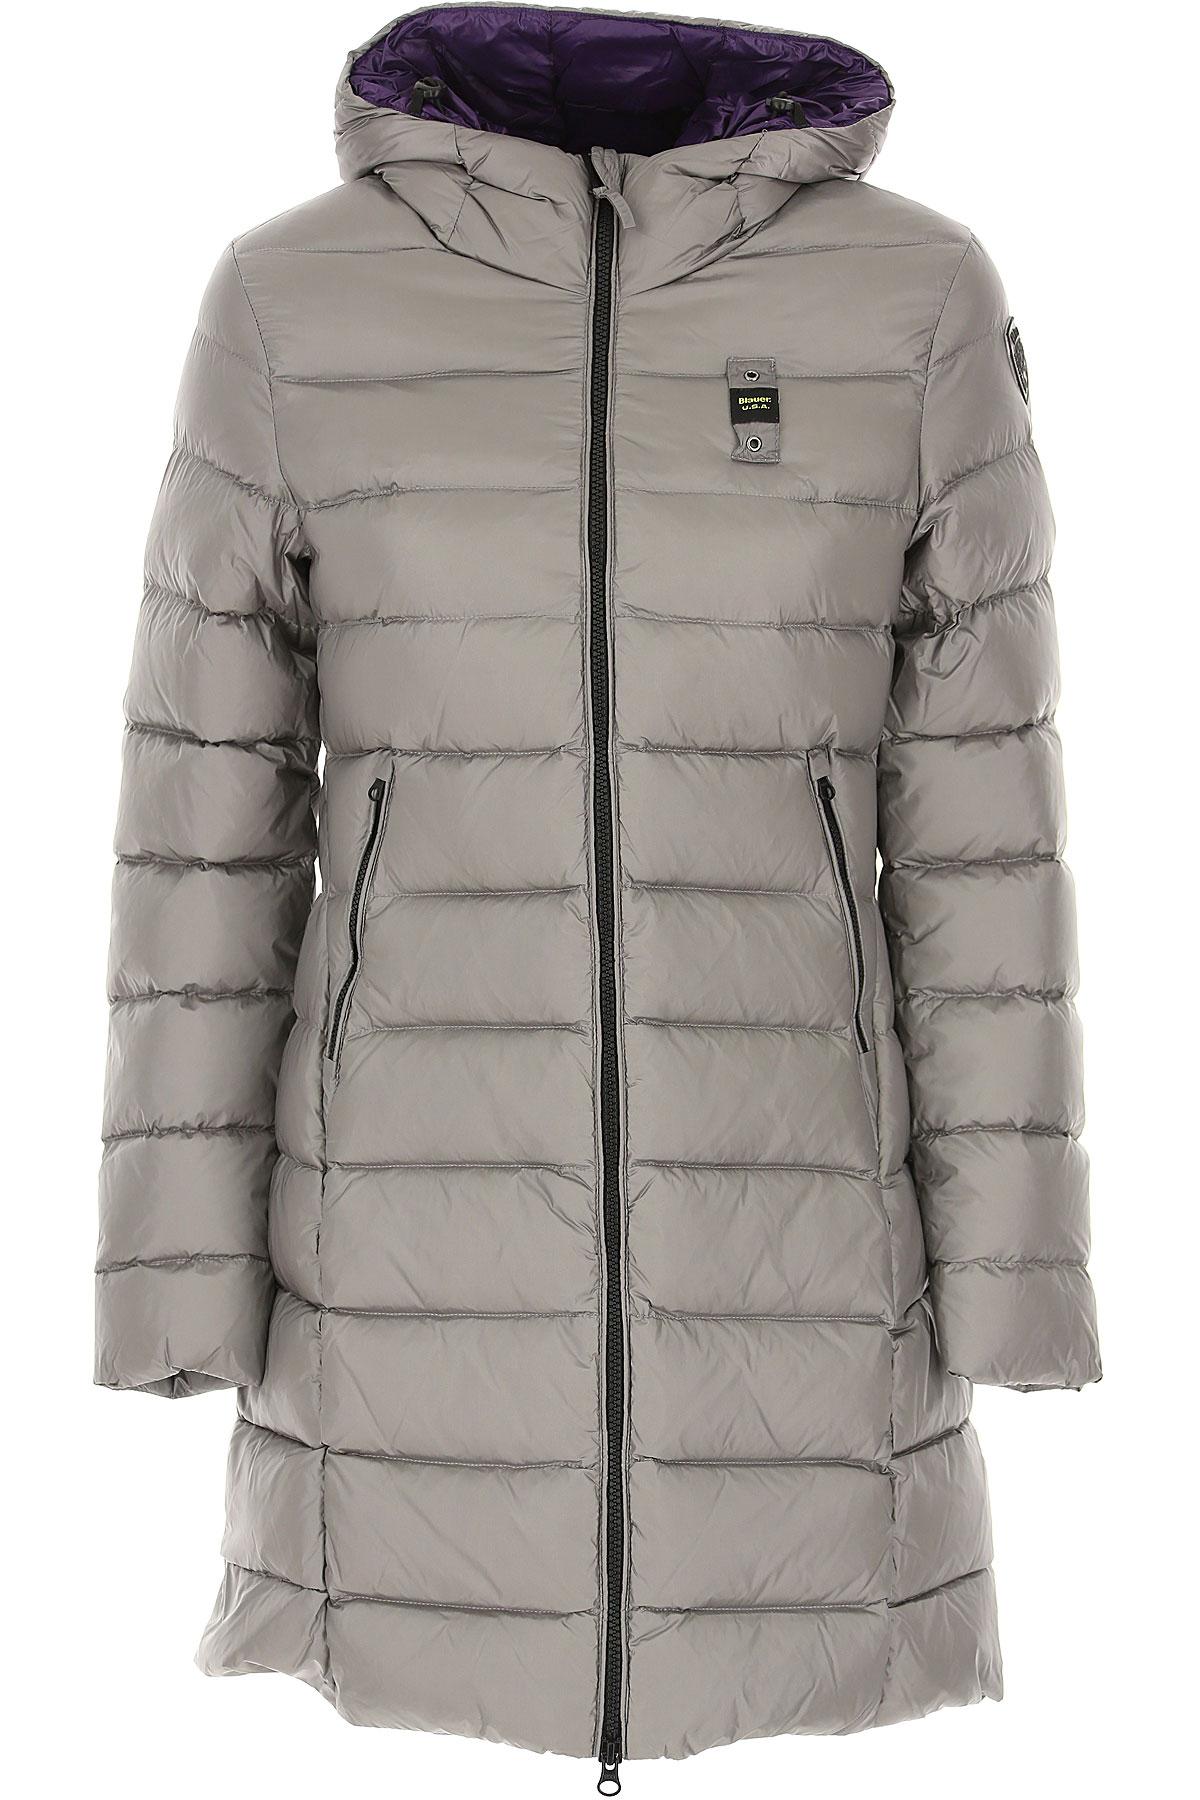 Blauer Down Jacket for Women, Puffer Ski Jacket On Sale, Light Grey, polyester, 2019, 2 4 6 8